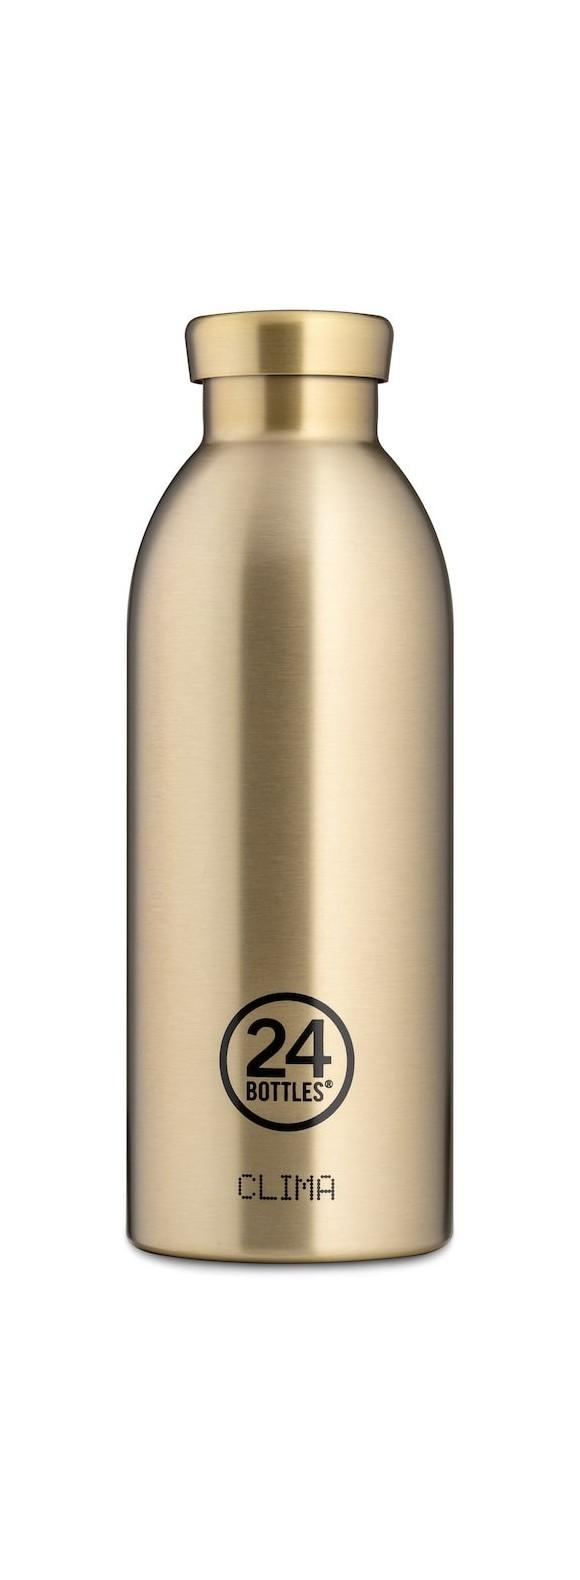 24 Bottles - Clima Bottle 0,5 L - Prosecco Gold (24B189)